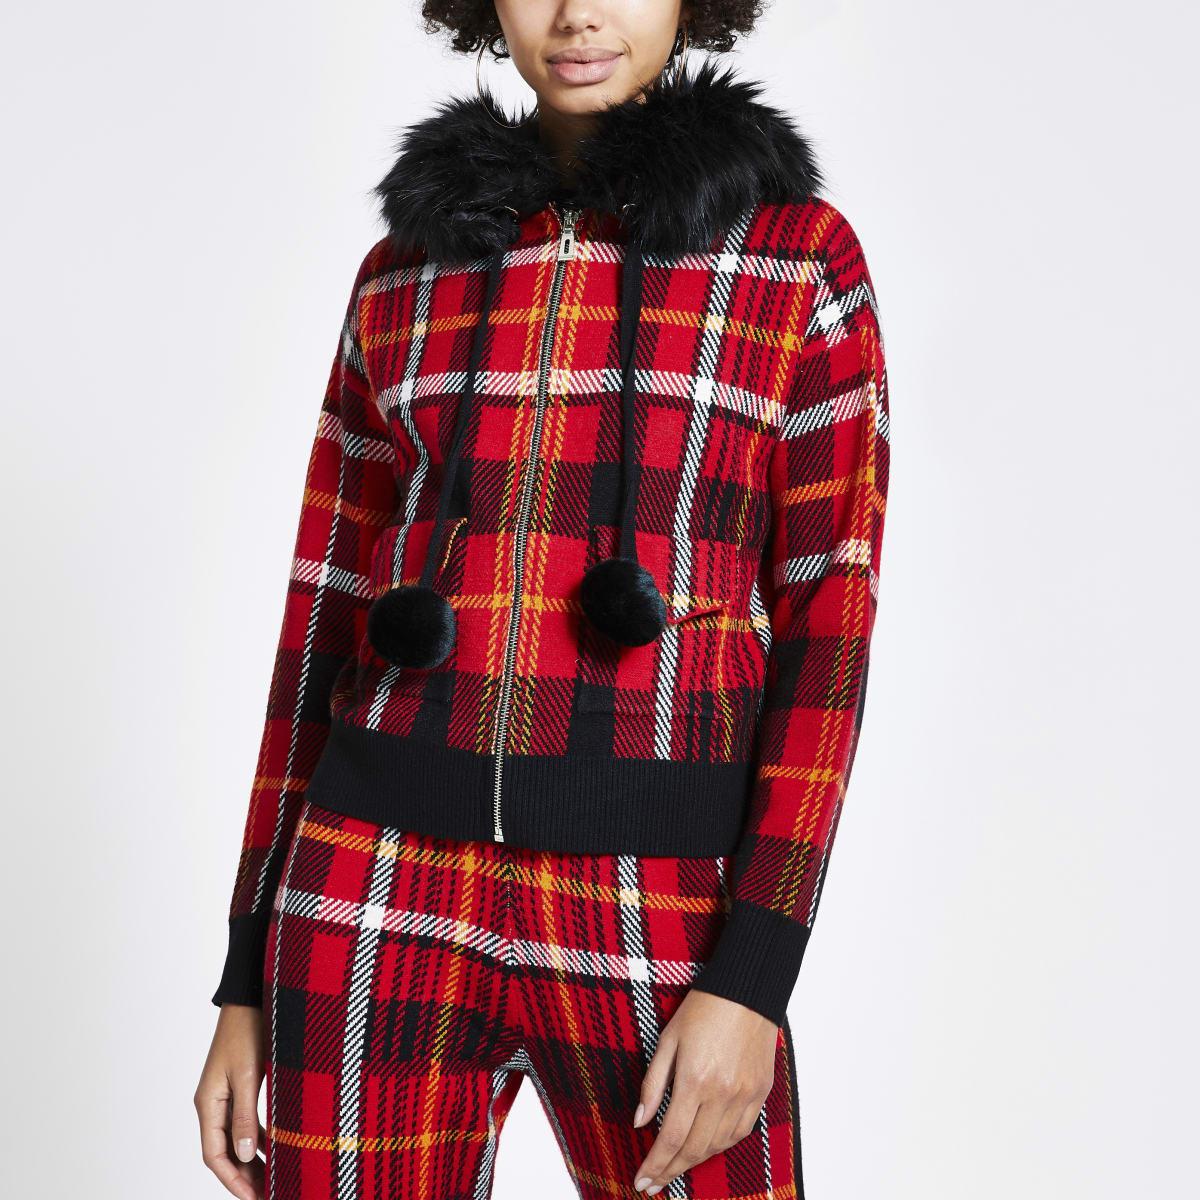 Rode geruite gebreide hoodie met rits voor